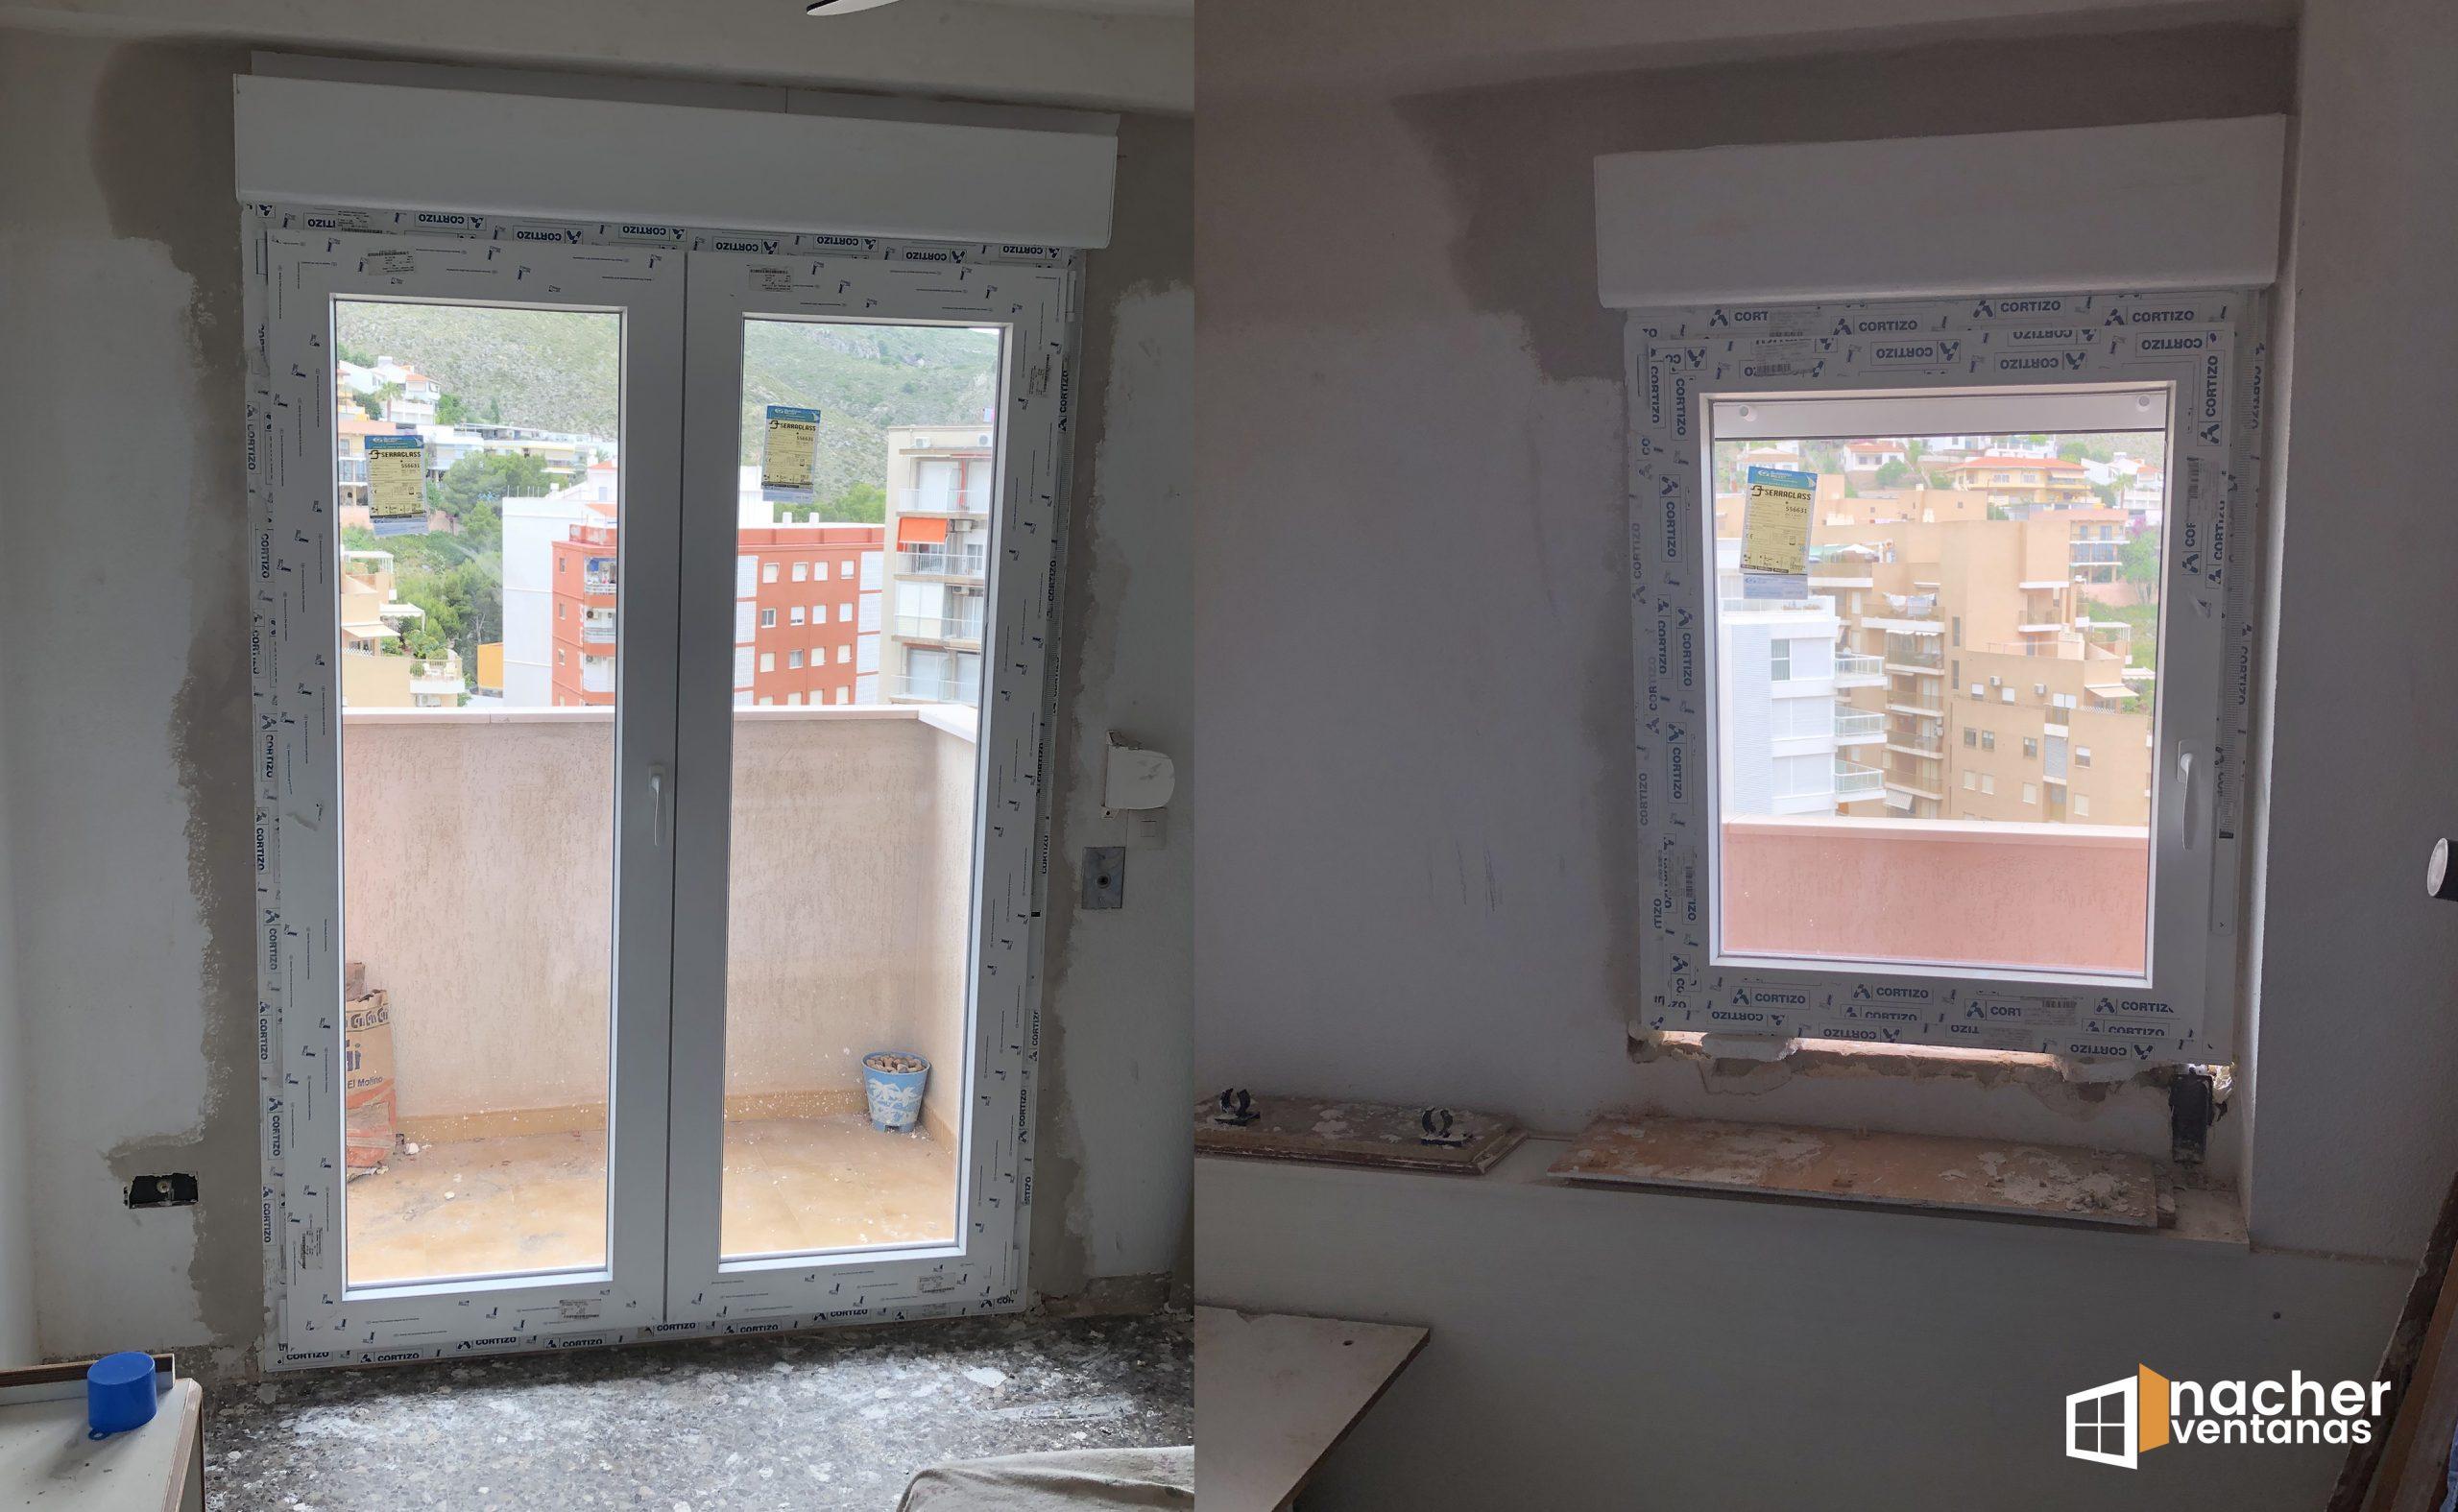 ventanas de pvc cullera